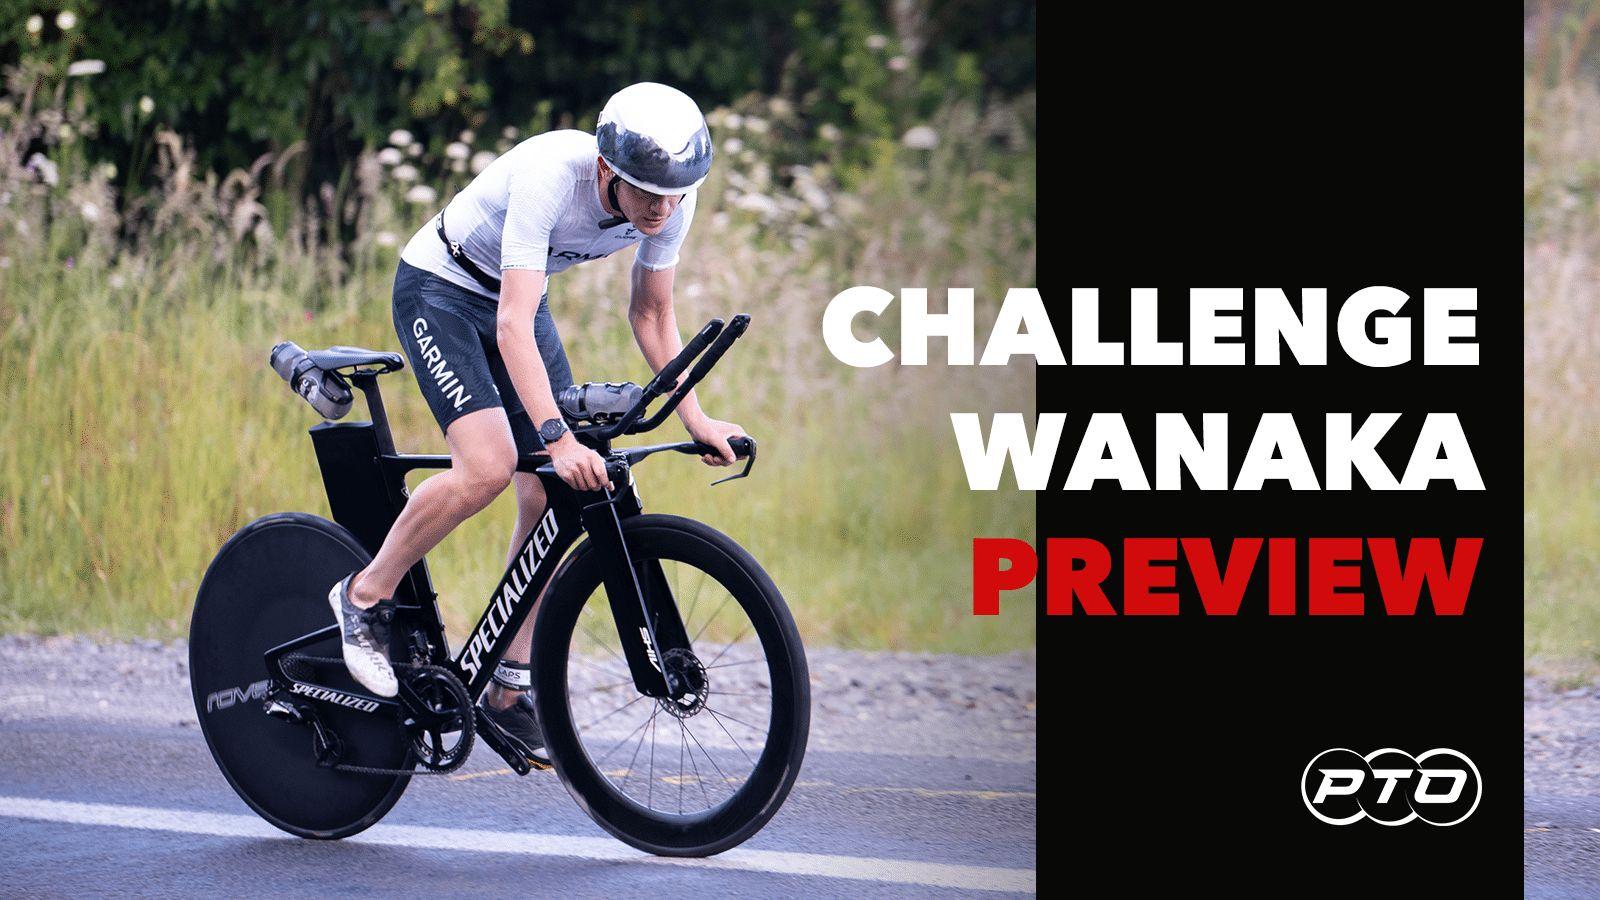 Challenge Wanaka: Wells dominates, Smith triumphs in Glendhu Bay